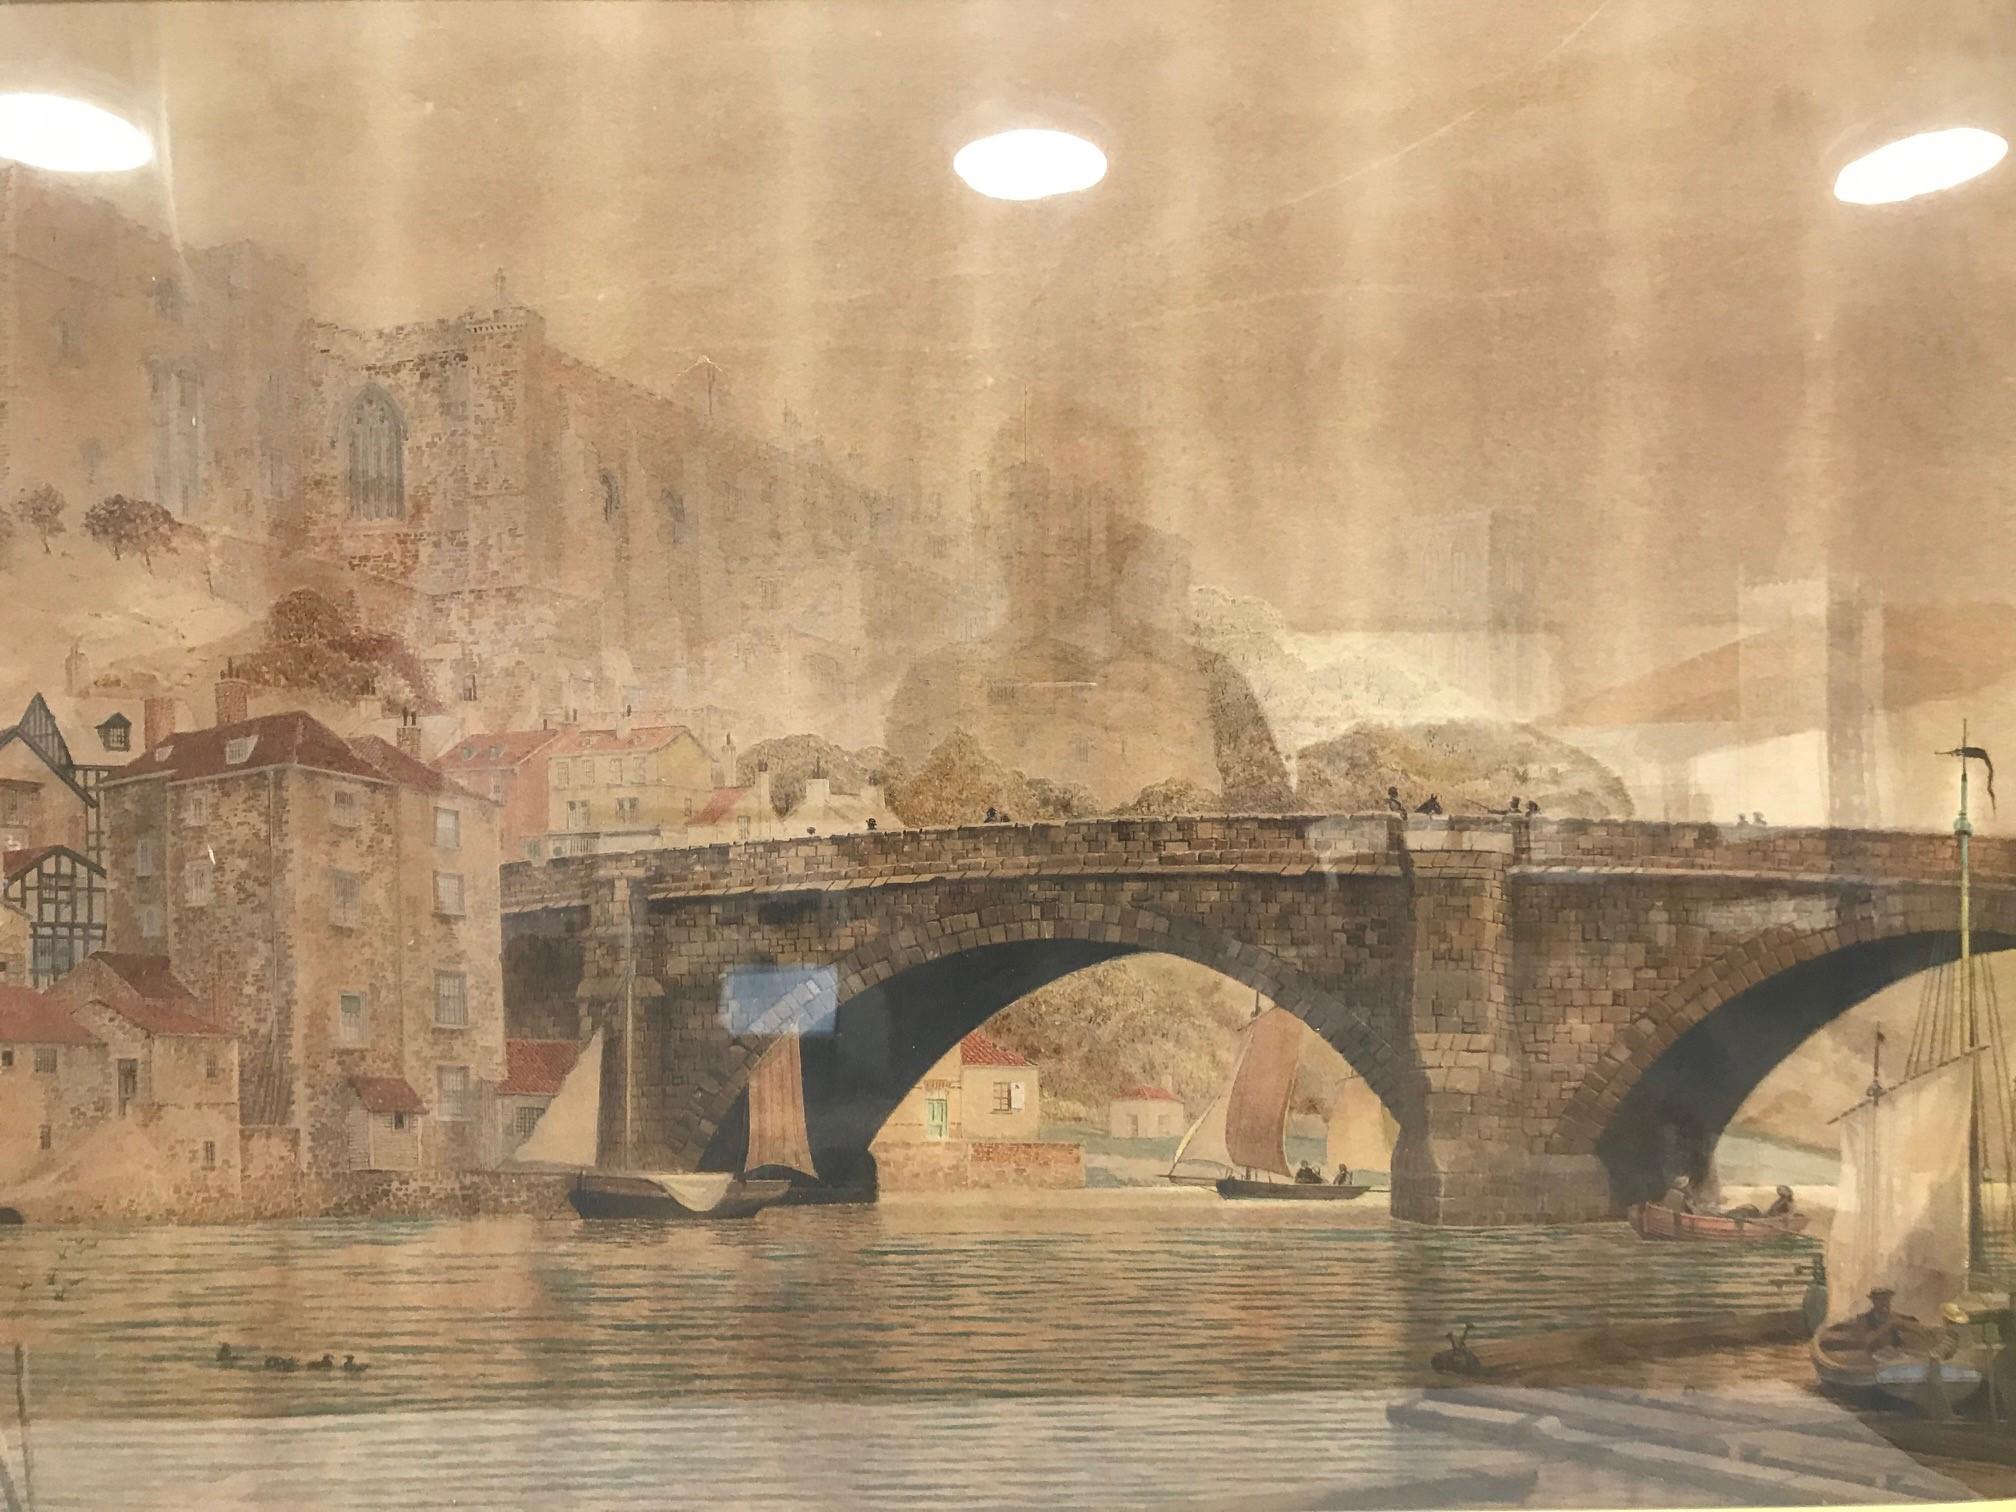 James Lawson Stewart (1841-1929) large British school watercolour on paper, riverside scene with